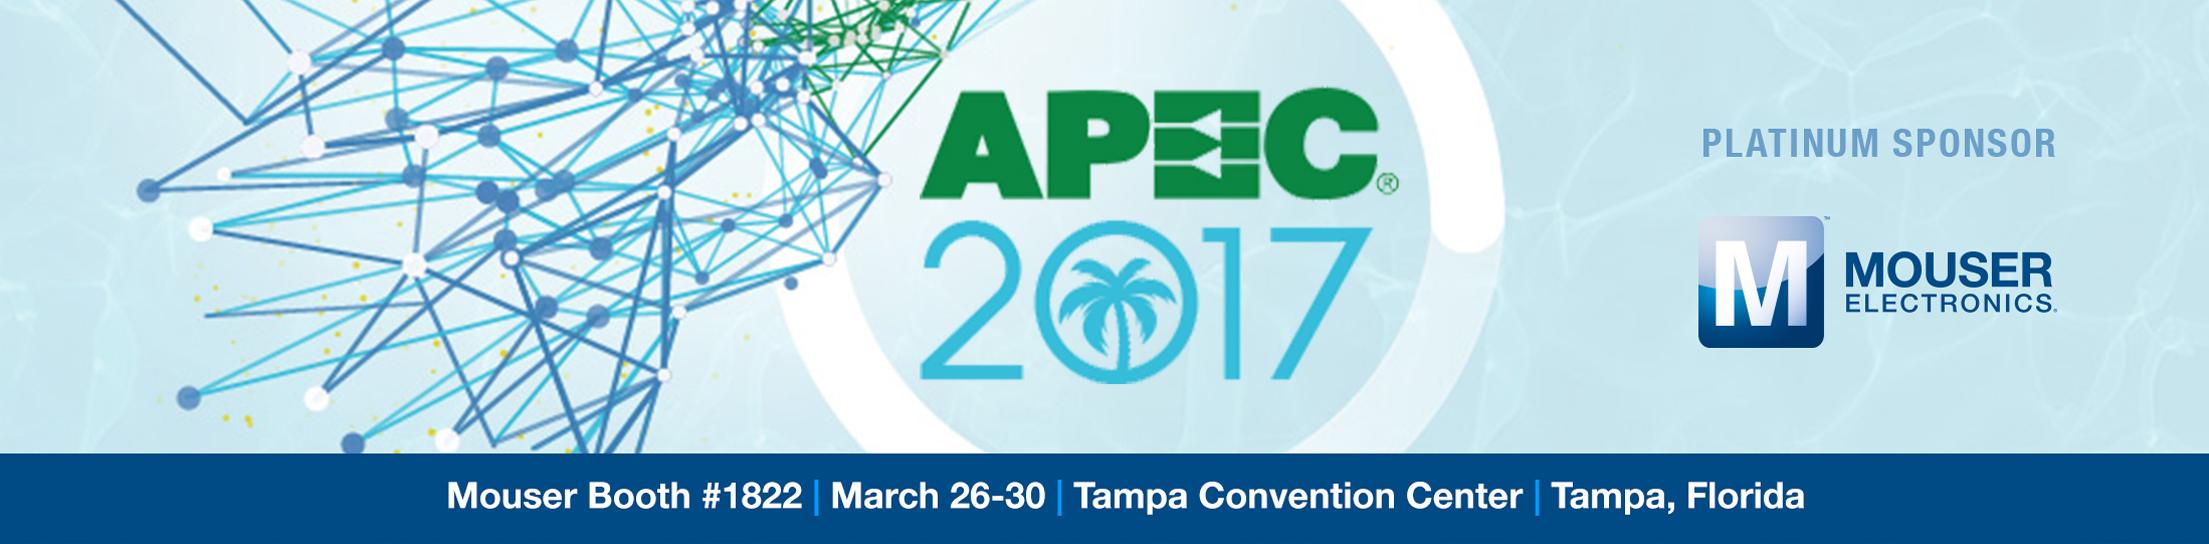 APECpr-hires